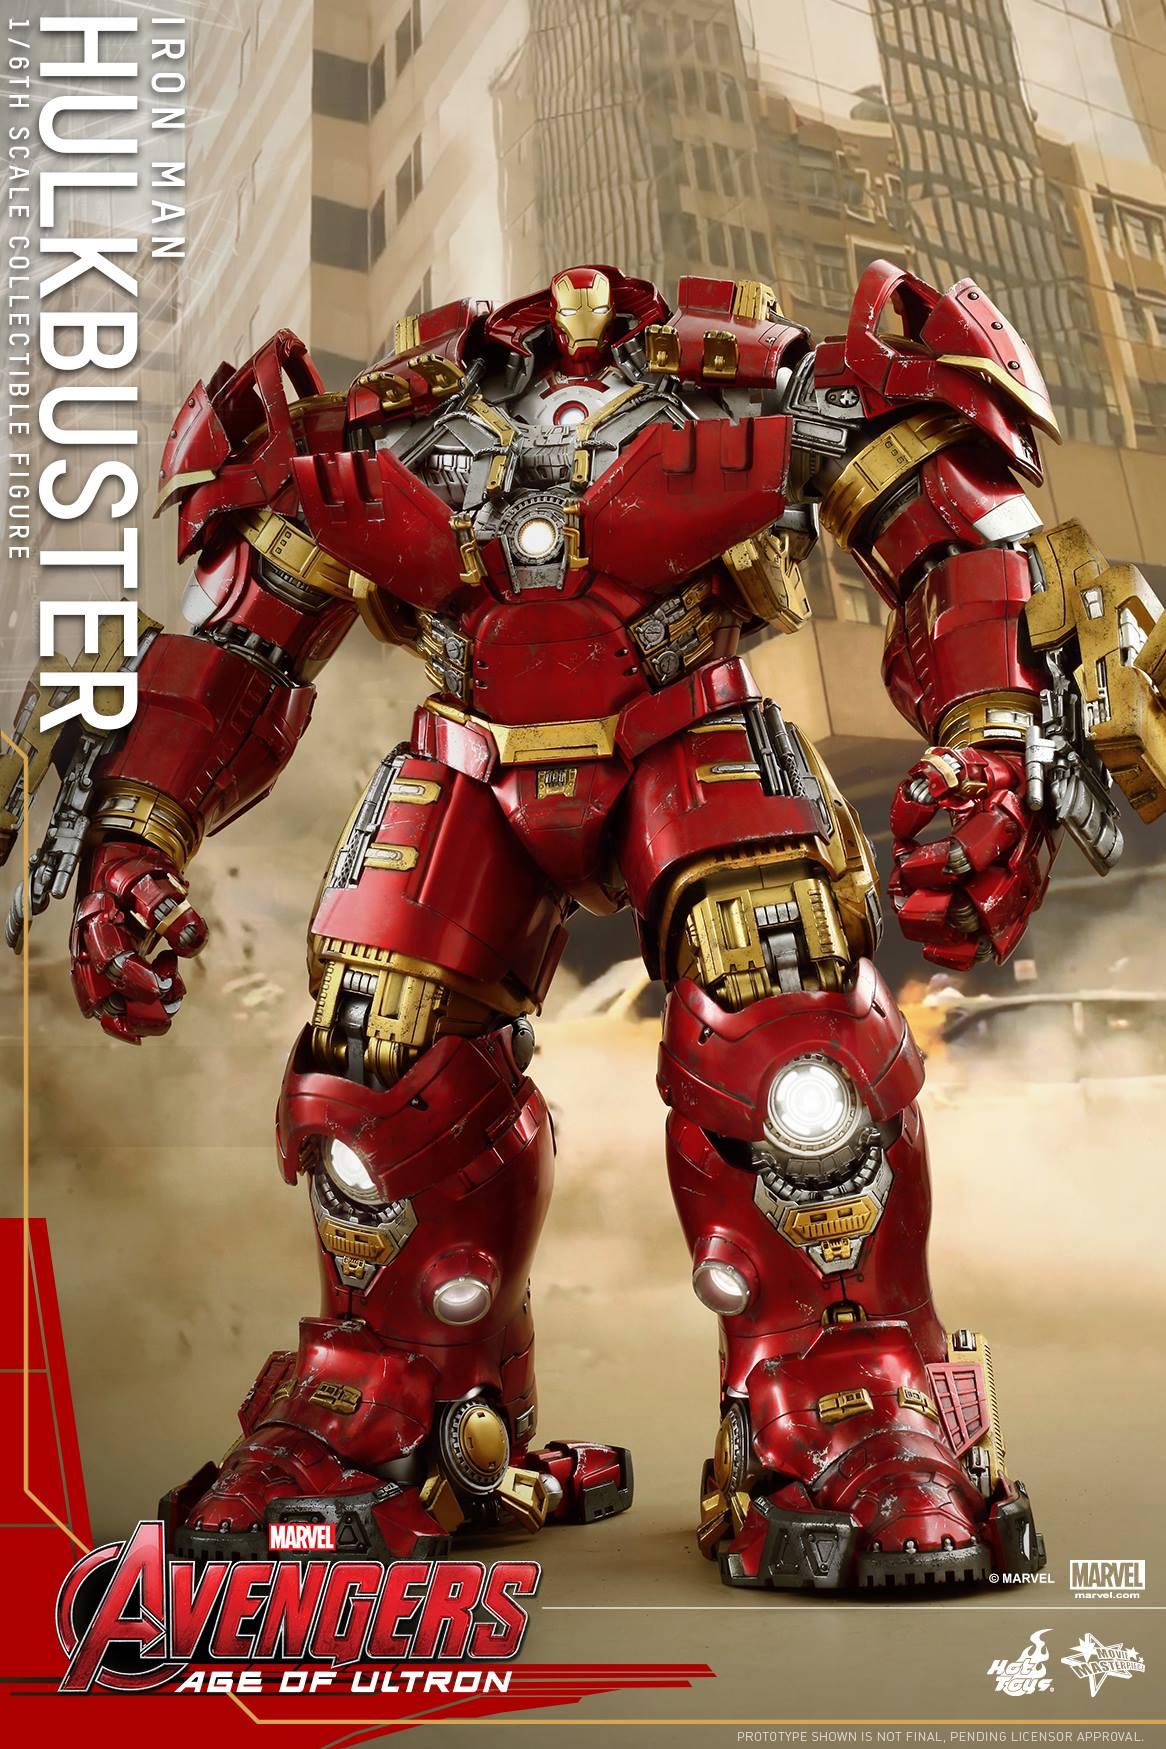 http://i2.wp.com/www.slashfilm.com/wp/wp-content/images/Hot-Toys-Avengers-Hulkbuster-16.jpg?fit=3000%2C3000